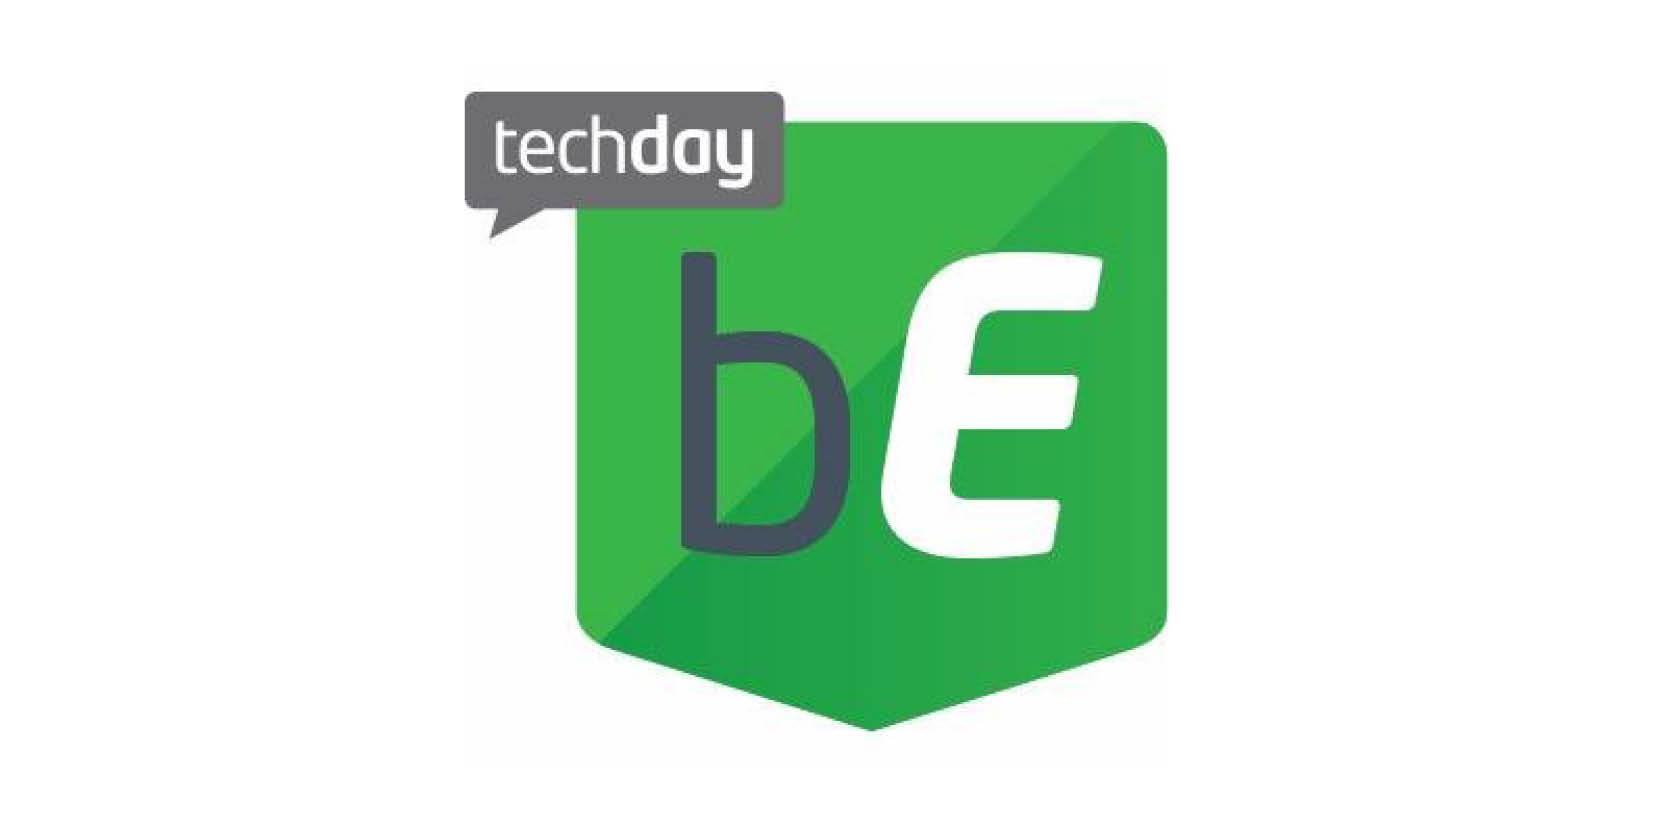 BizEdge: Yahoo data breach: Gemalto, Digital Shadows and TeleSign experts chime in